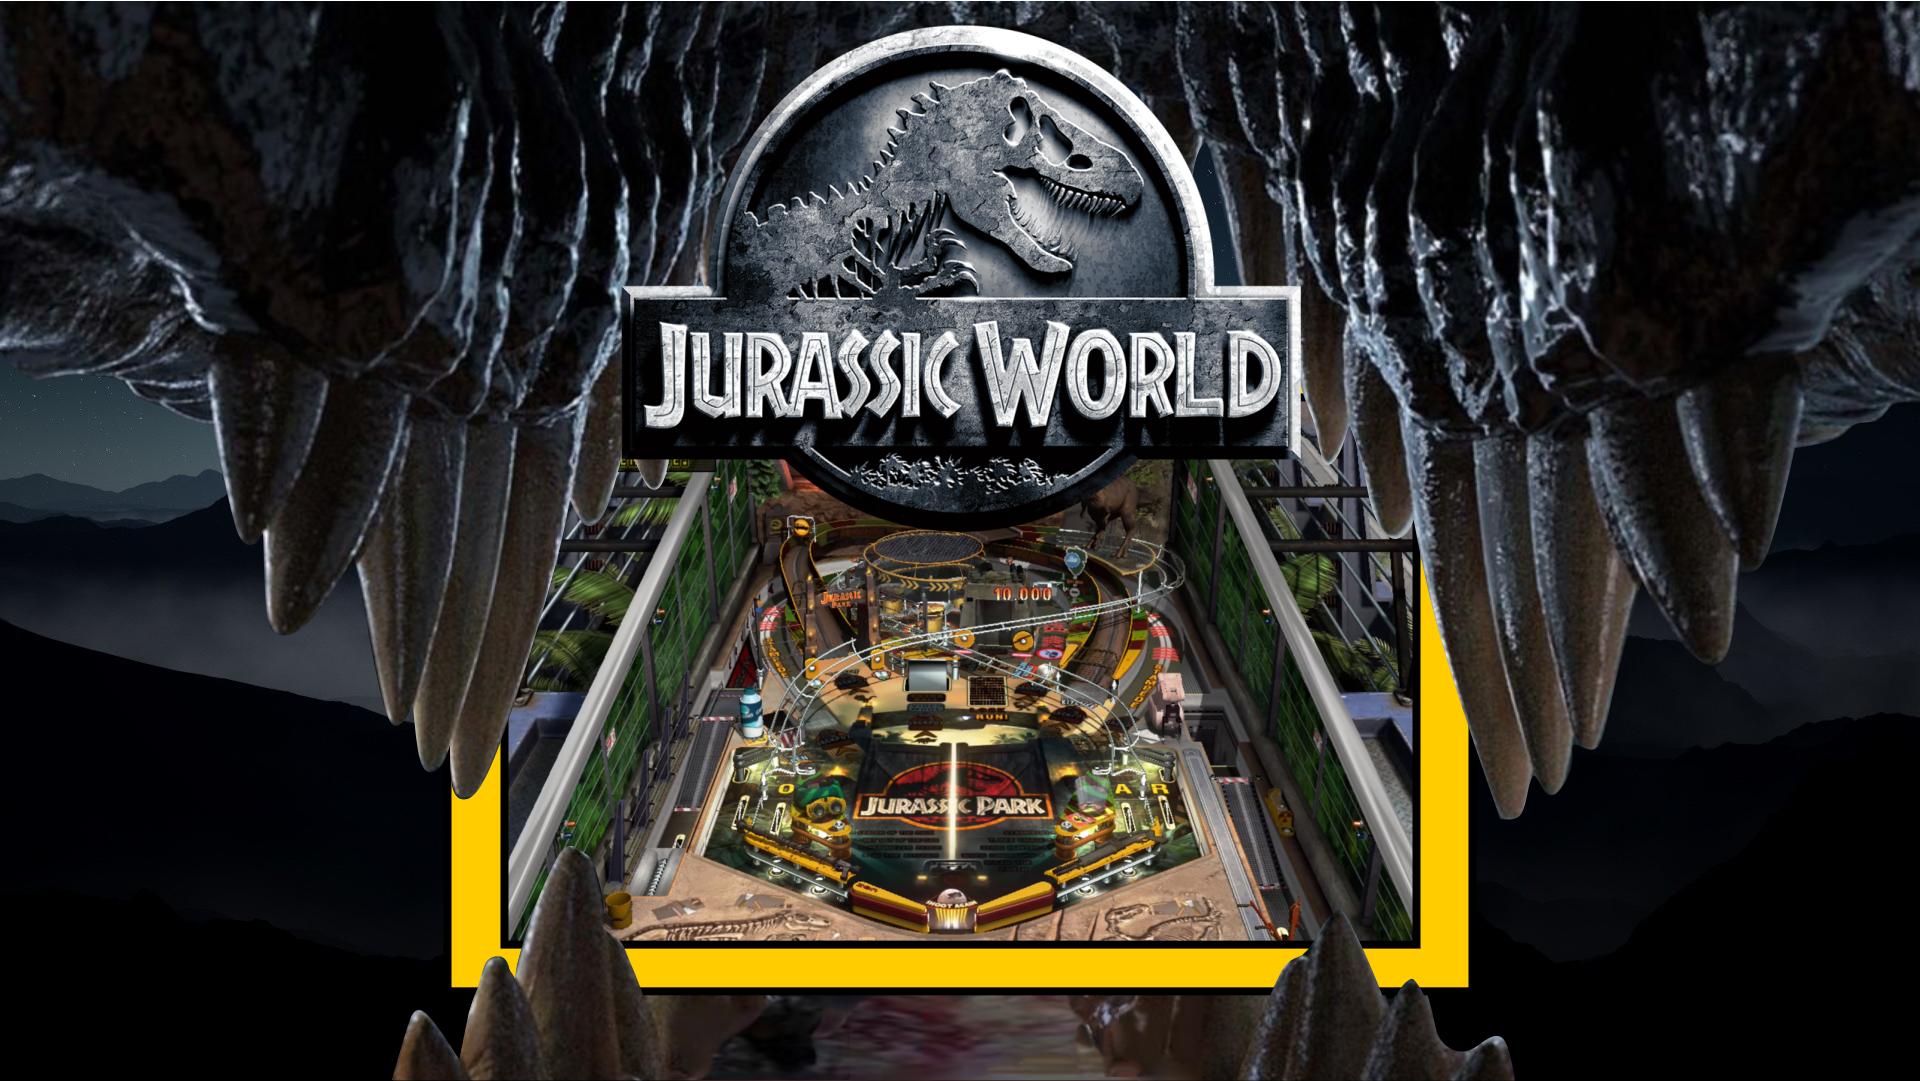 Jurassic World (Pinball FX3) 16x9 - Game Themes (16:9ST